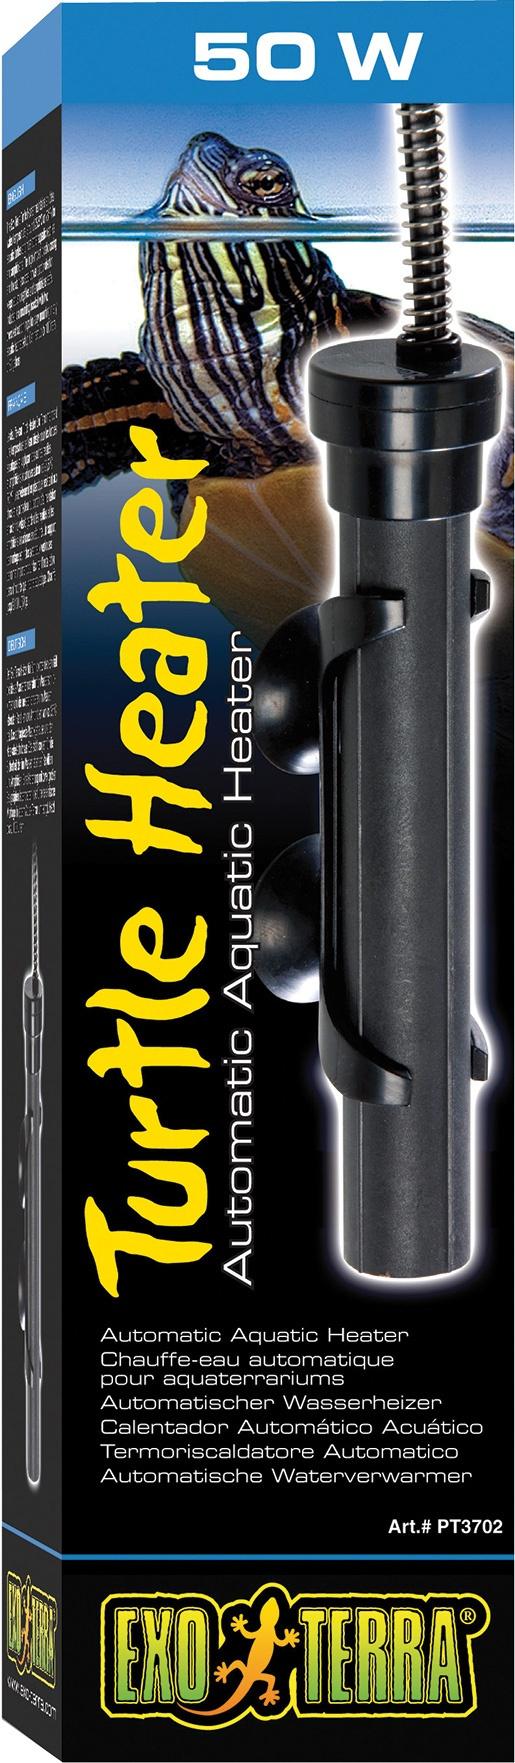 Аксессуары для террариев - ExoTerra Turtle Heater 50W